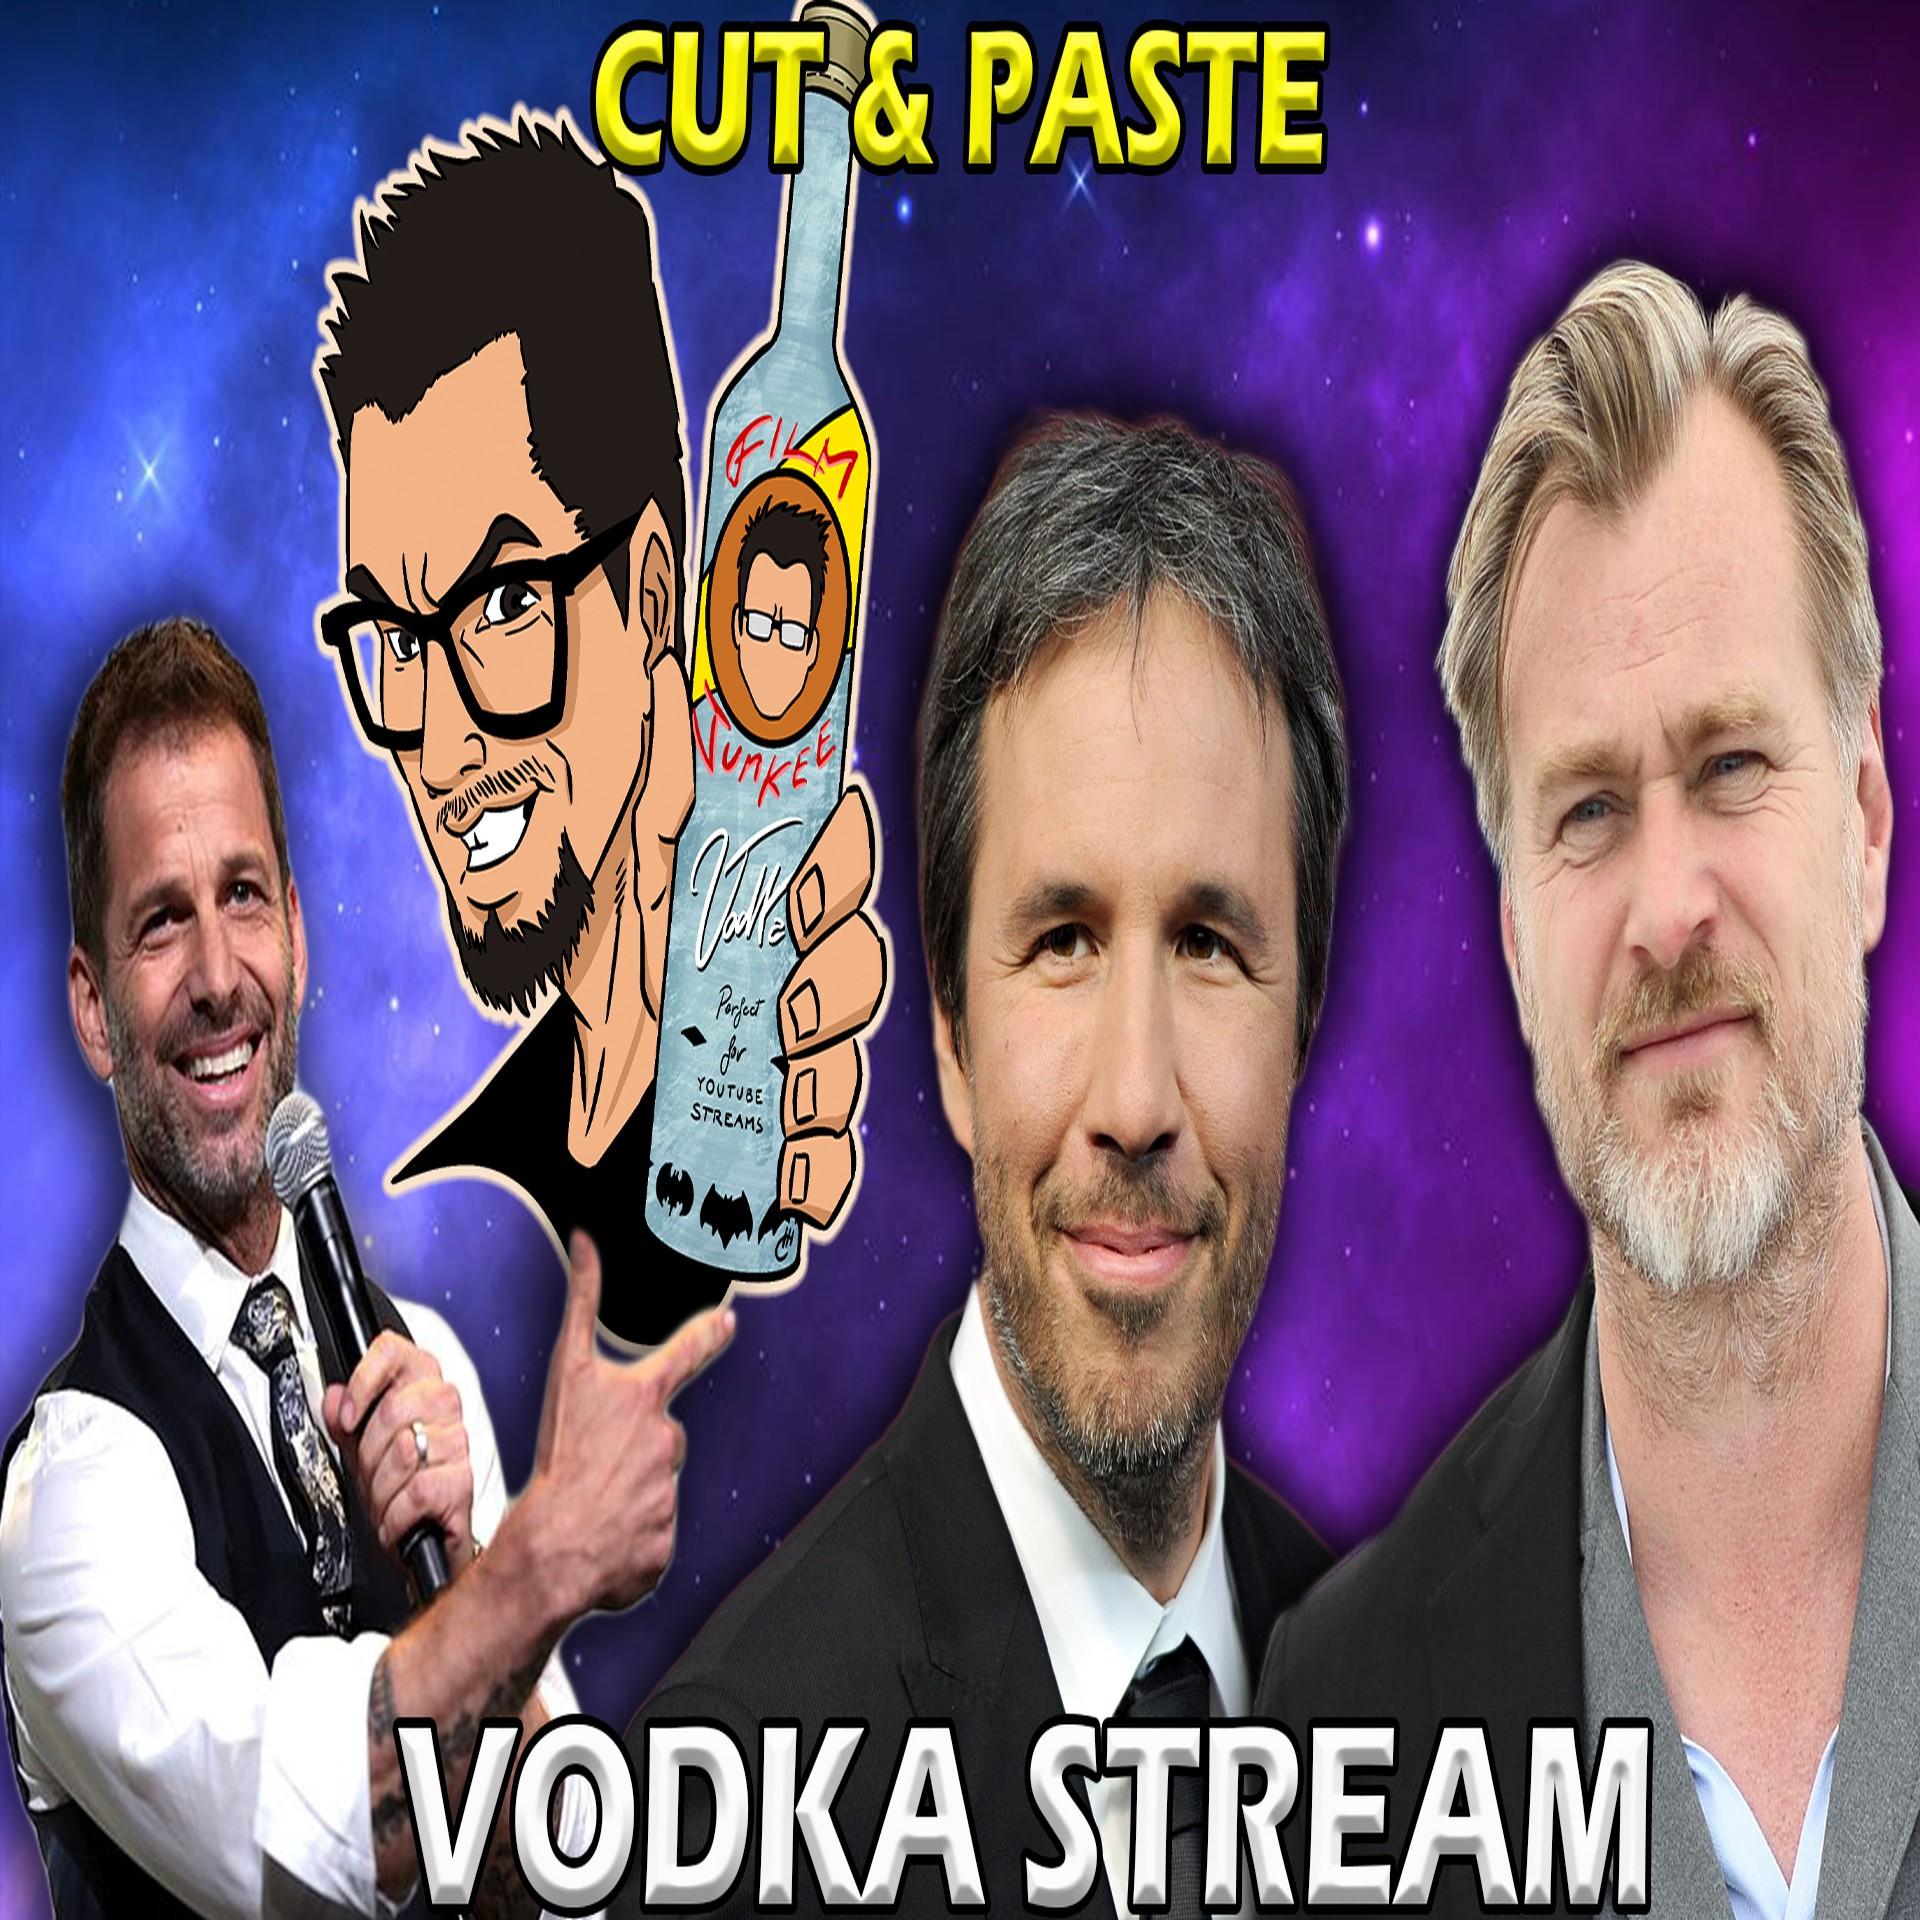 The Vodka Stream